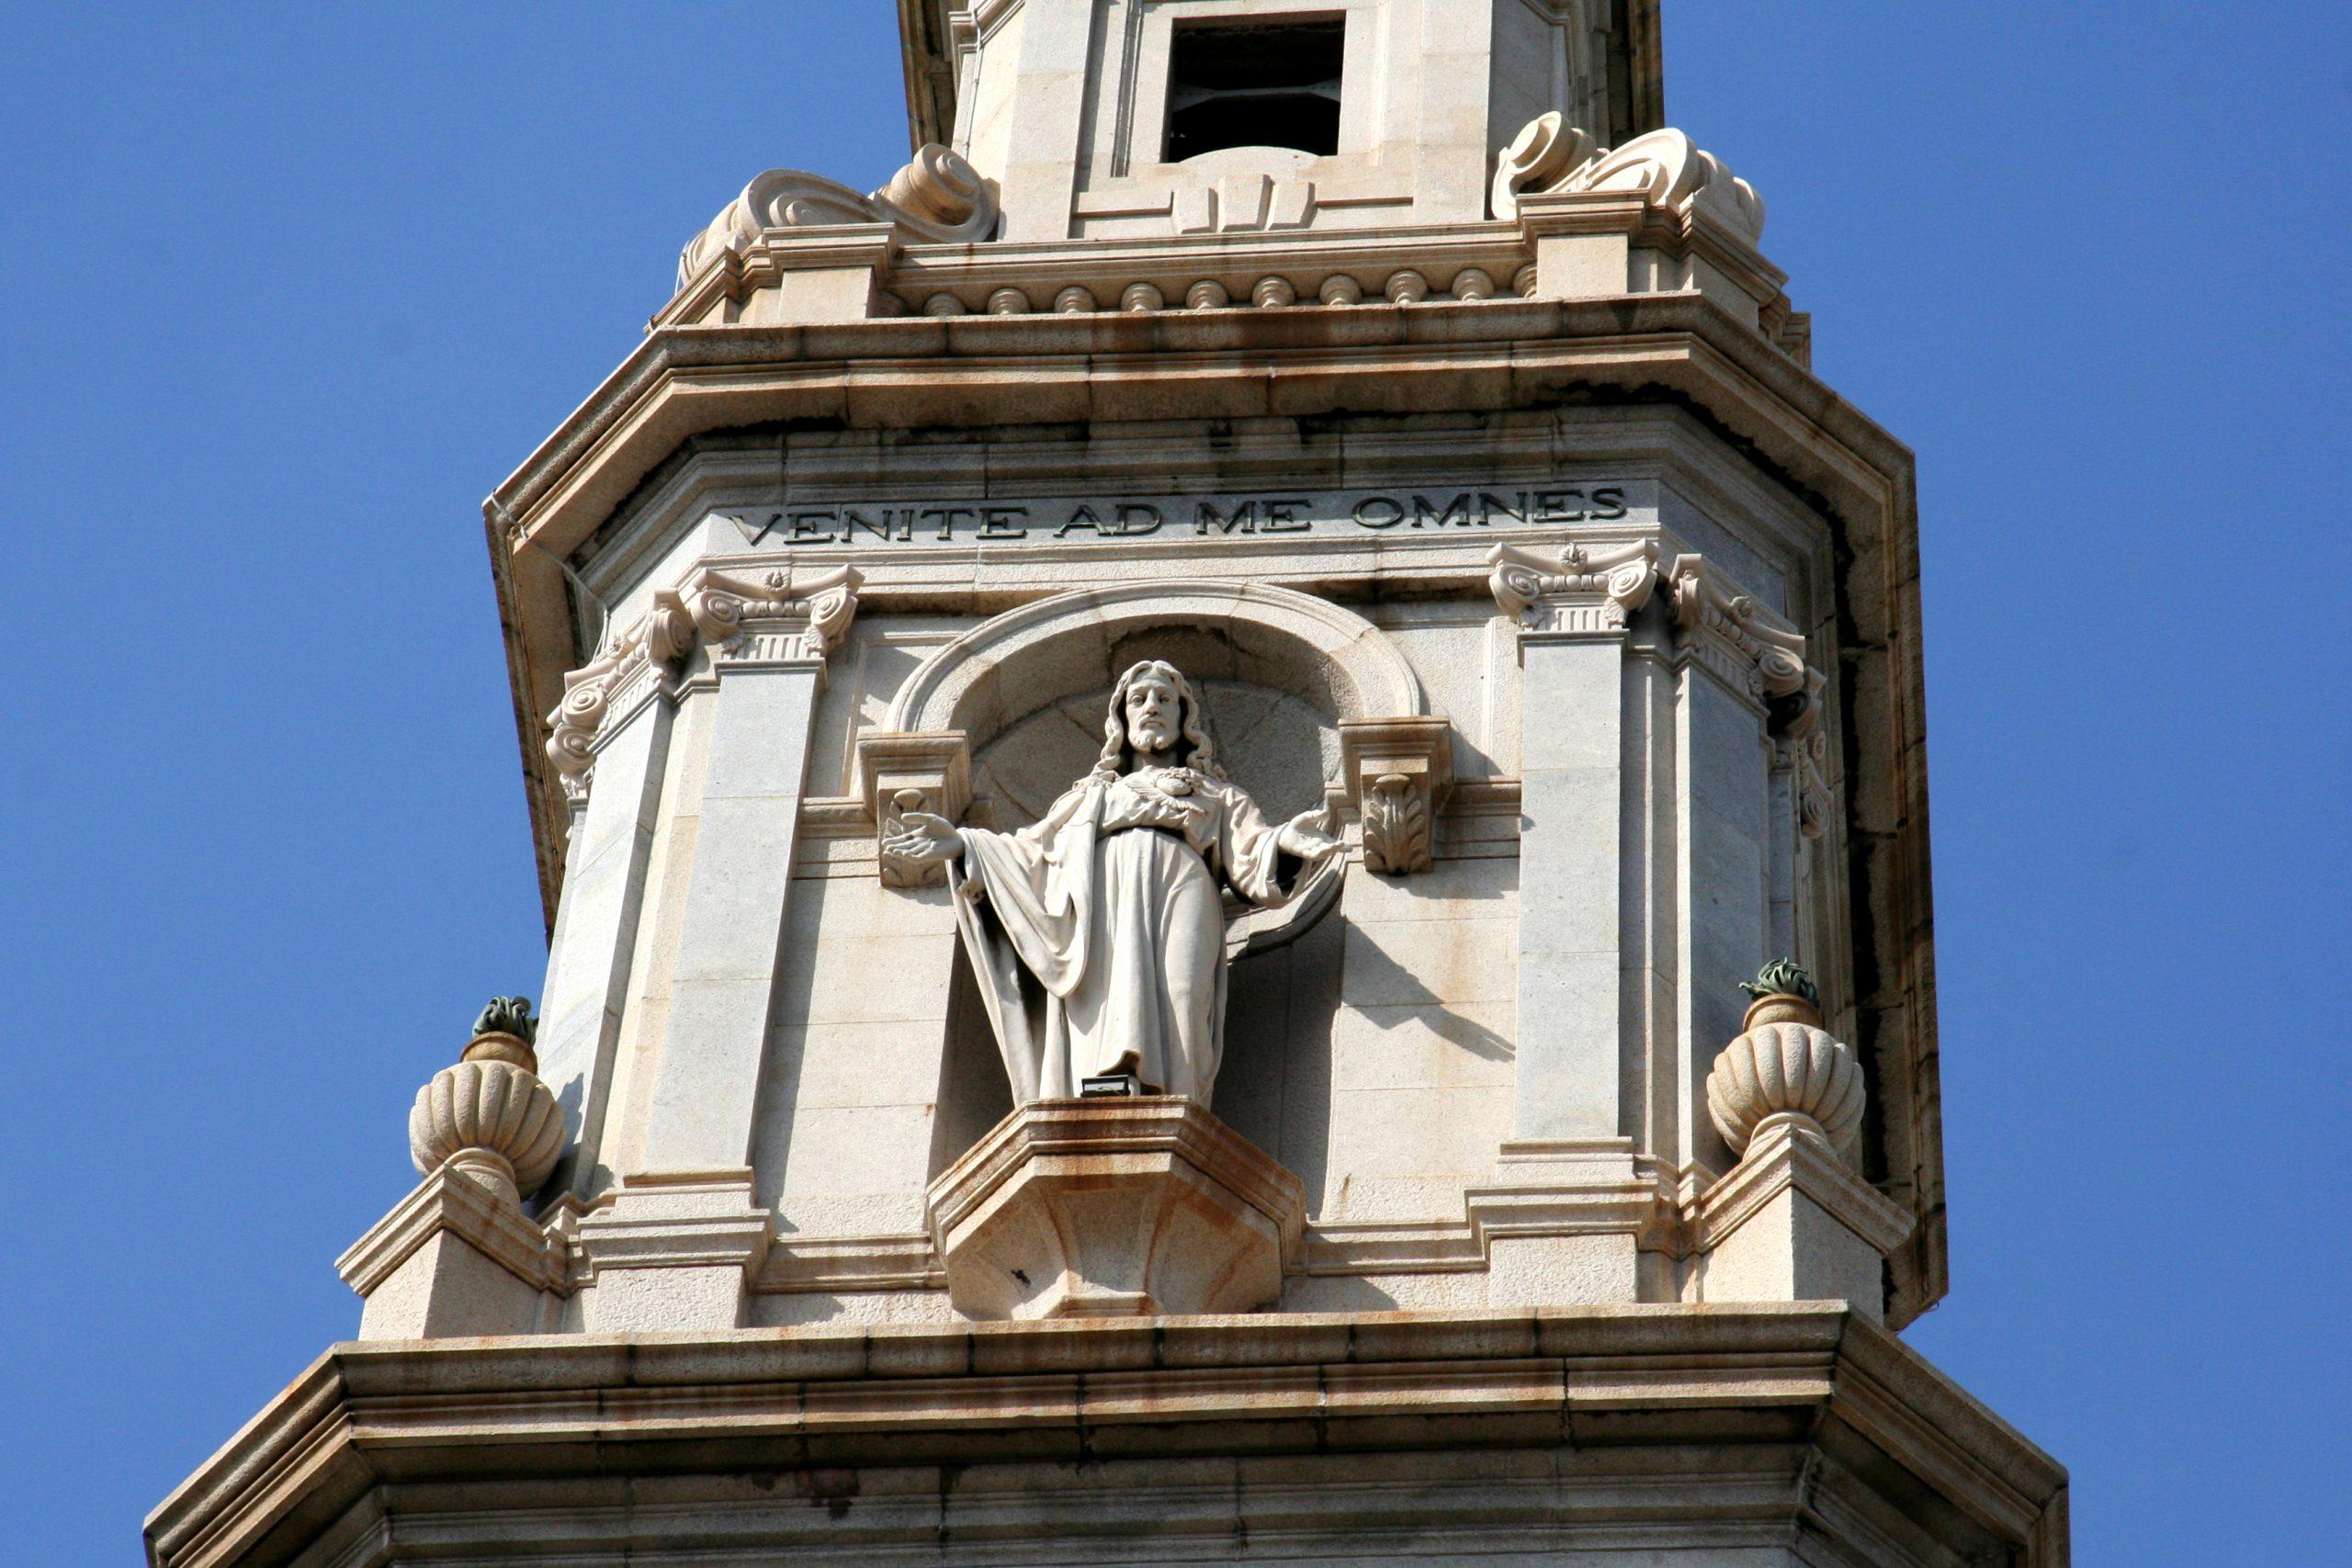 2009, Santuario della Beata Vergine del Rosario, Pompeii, Italy